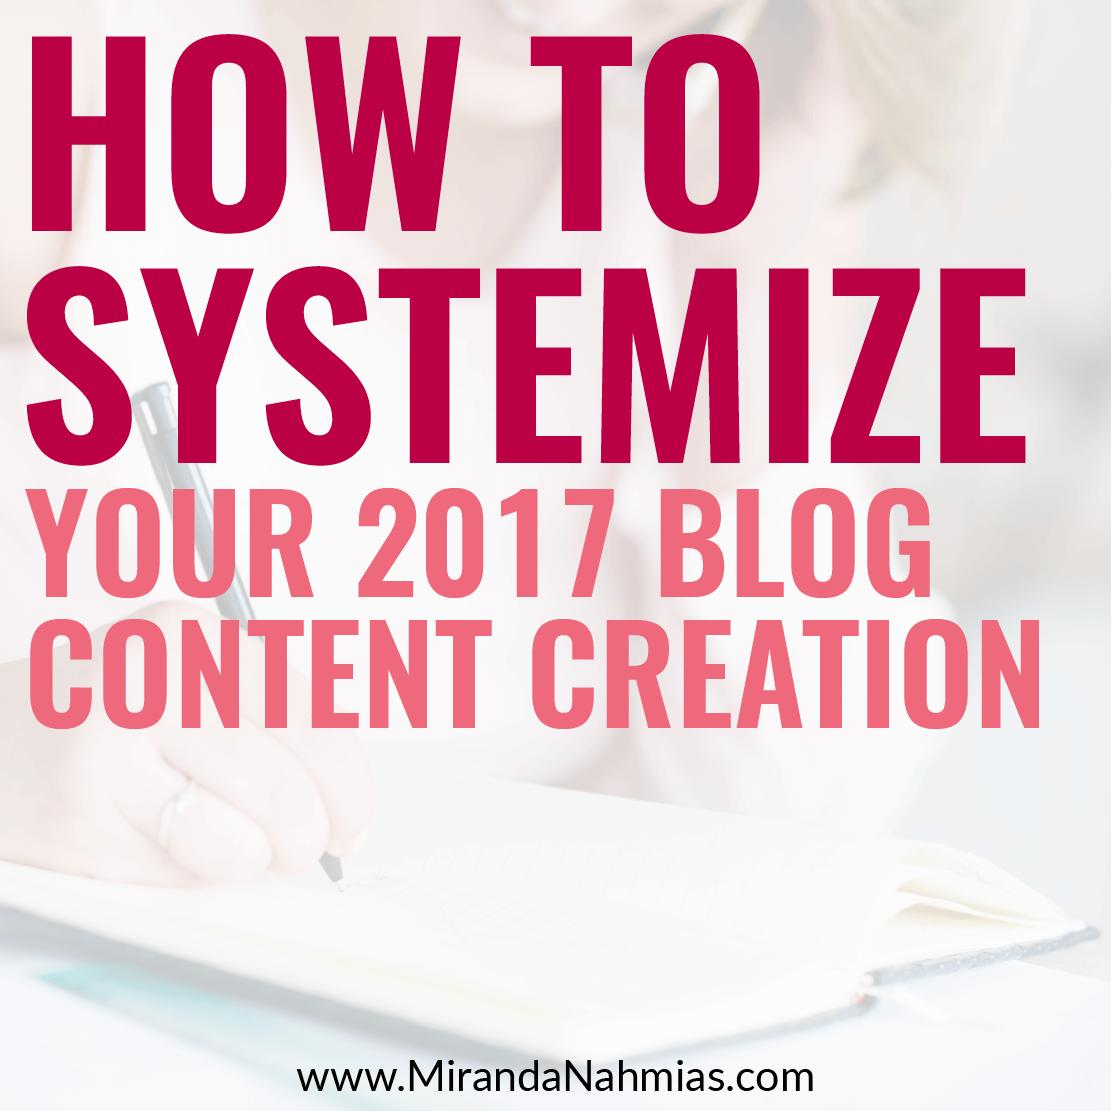 2017 Blog Content Creation Square